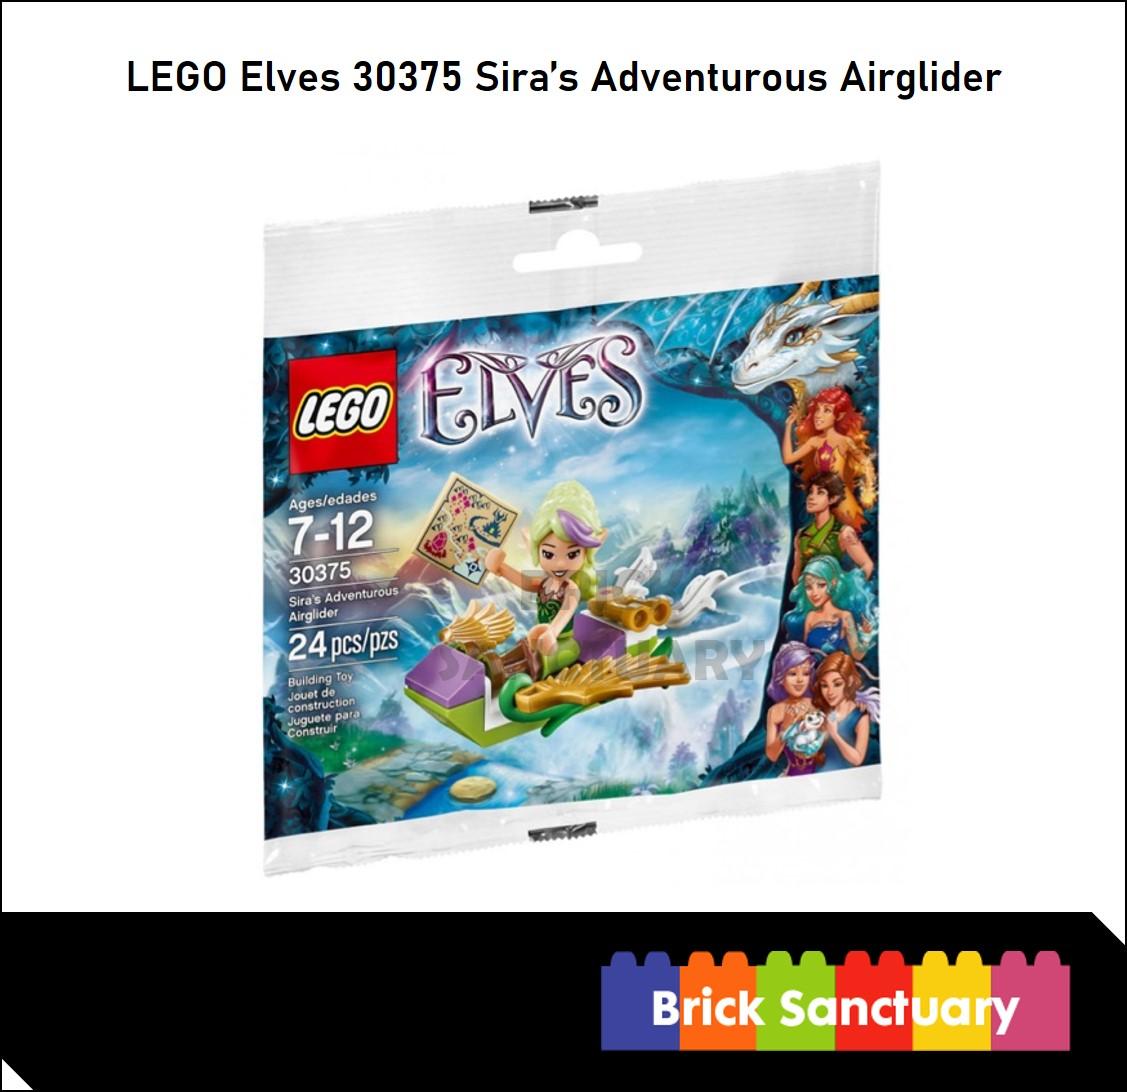 LEGO 30375 : Elves Sira's Adventurous Airglider